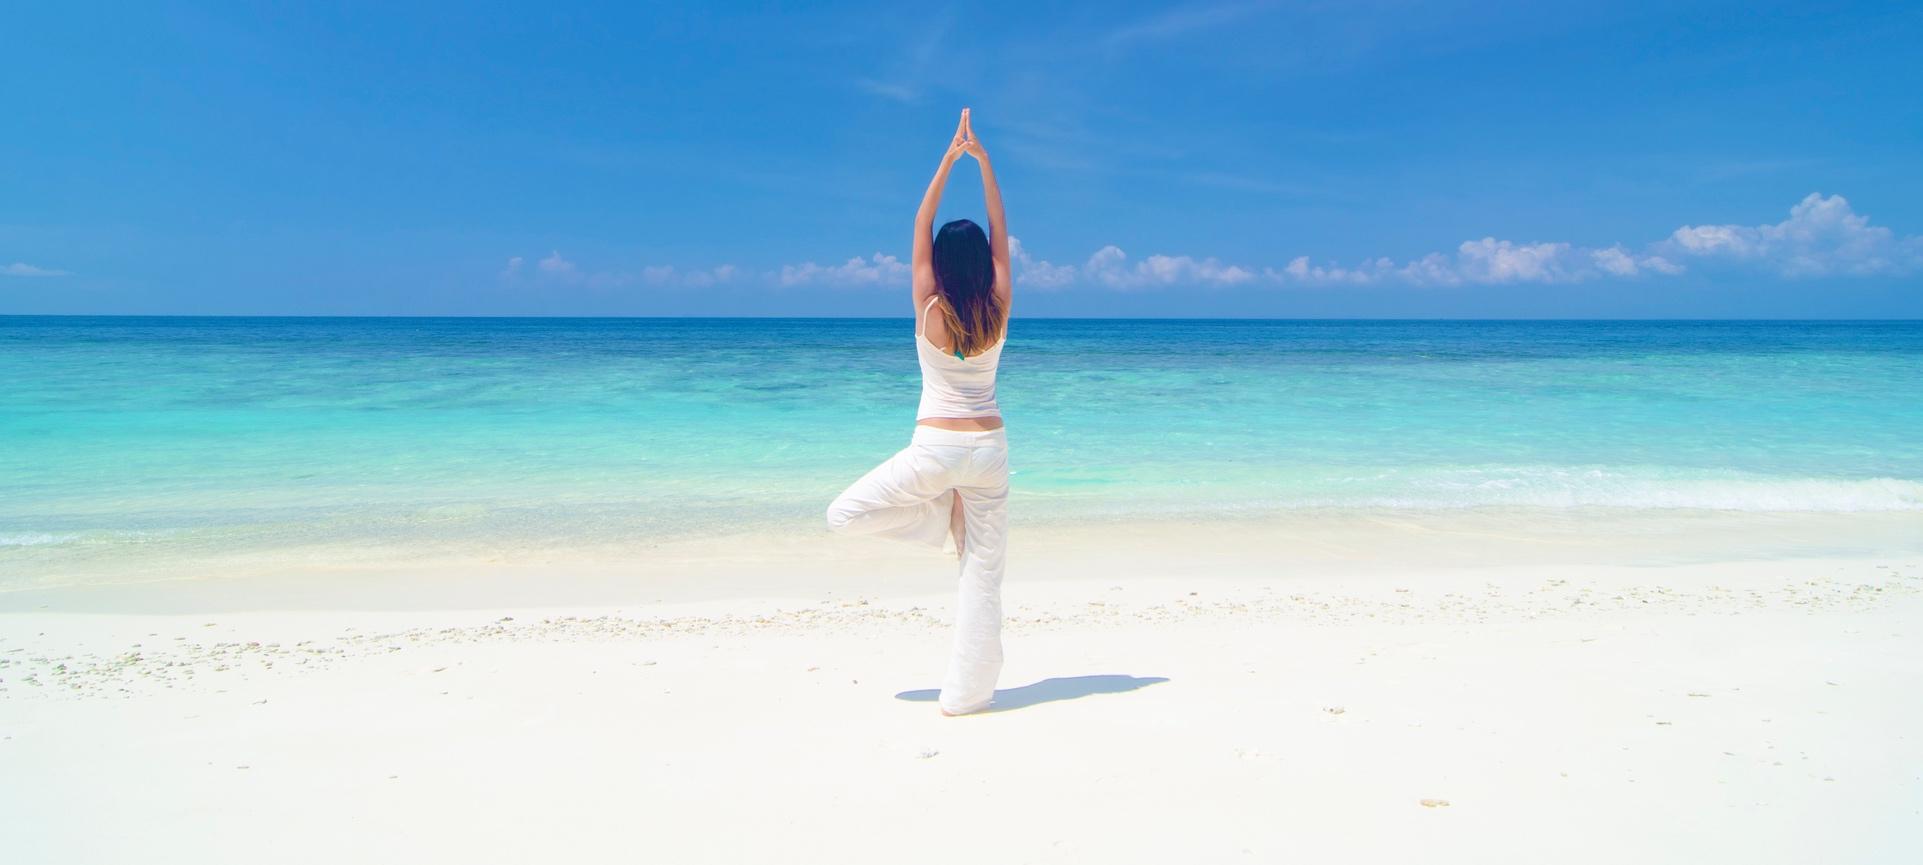 yoga retreat greece kythnos 2019 with Theresa Moodie Wellness